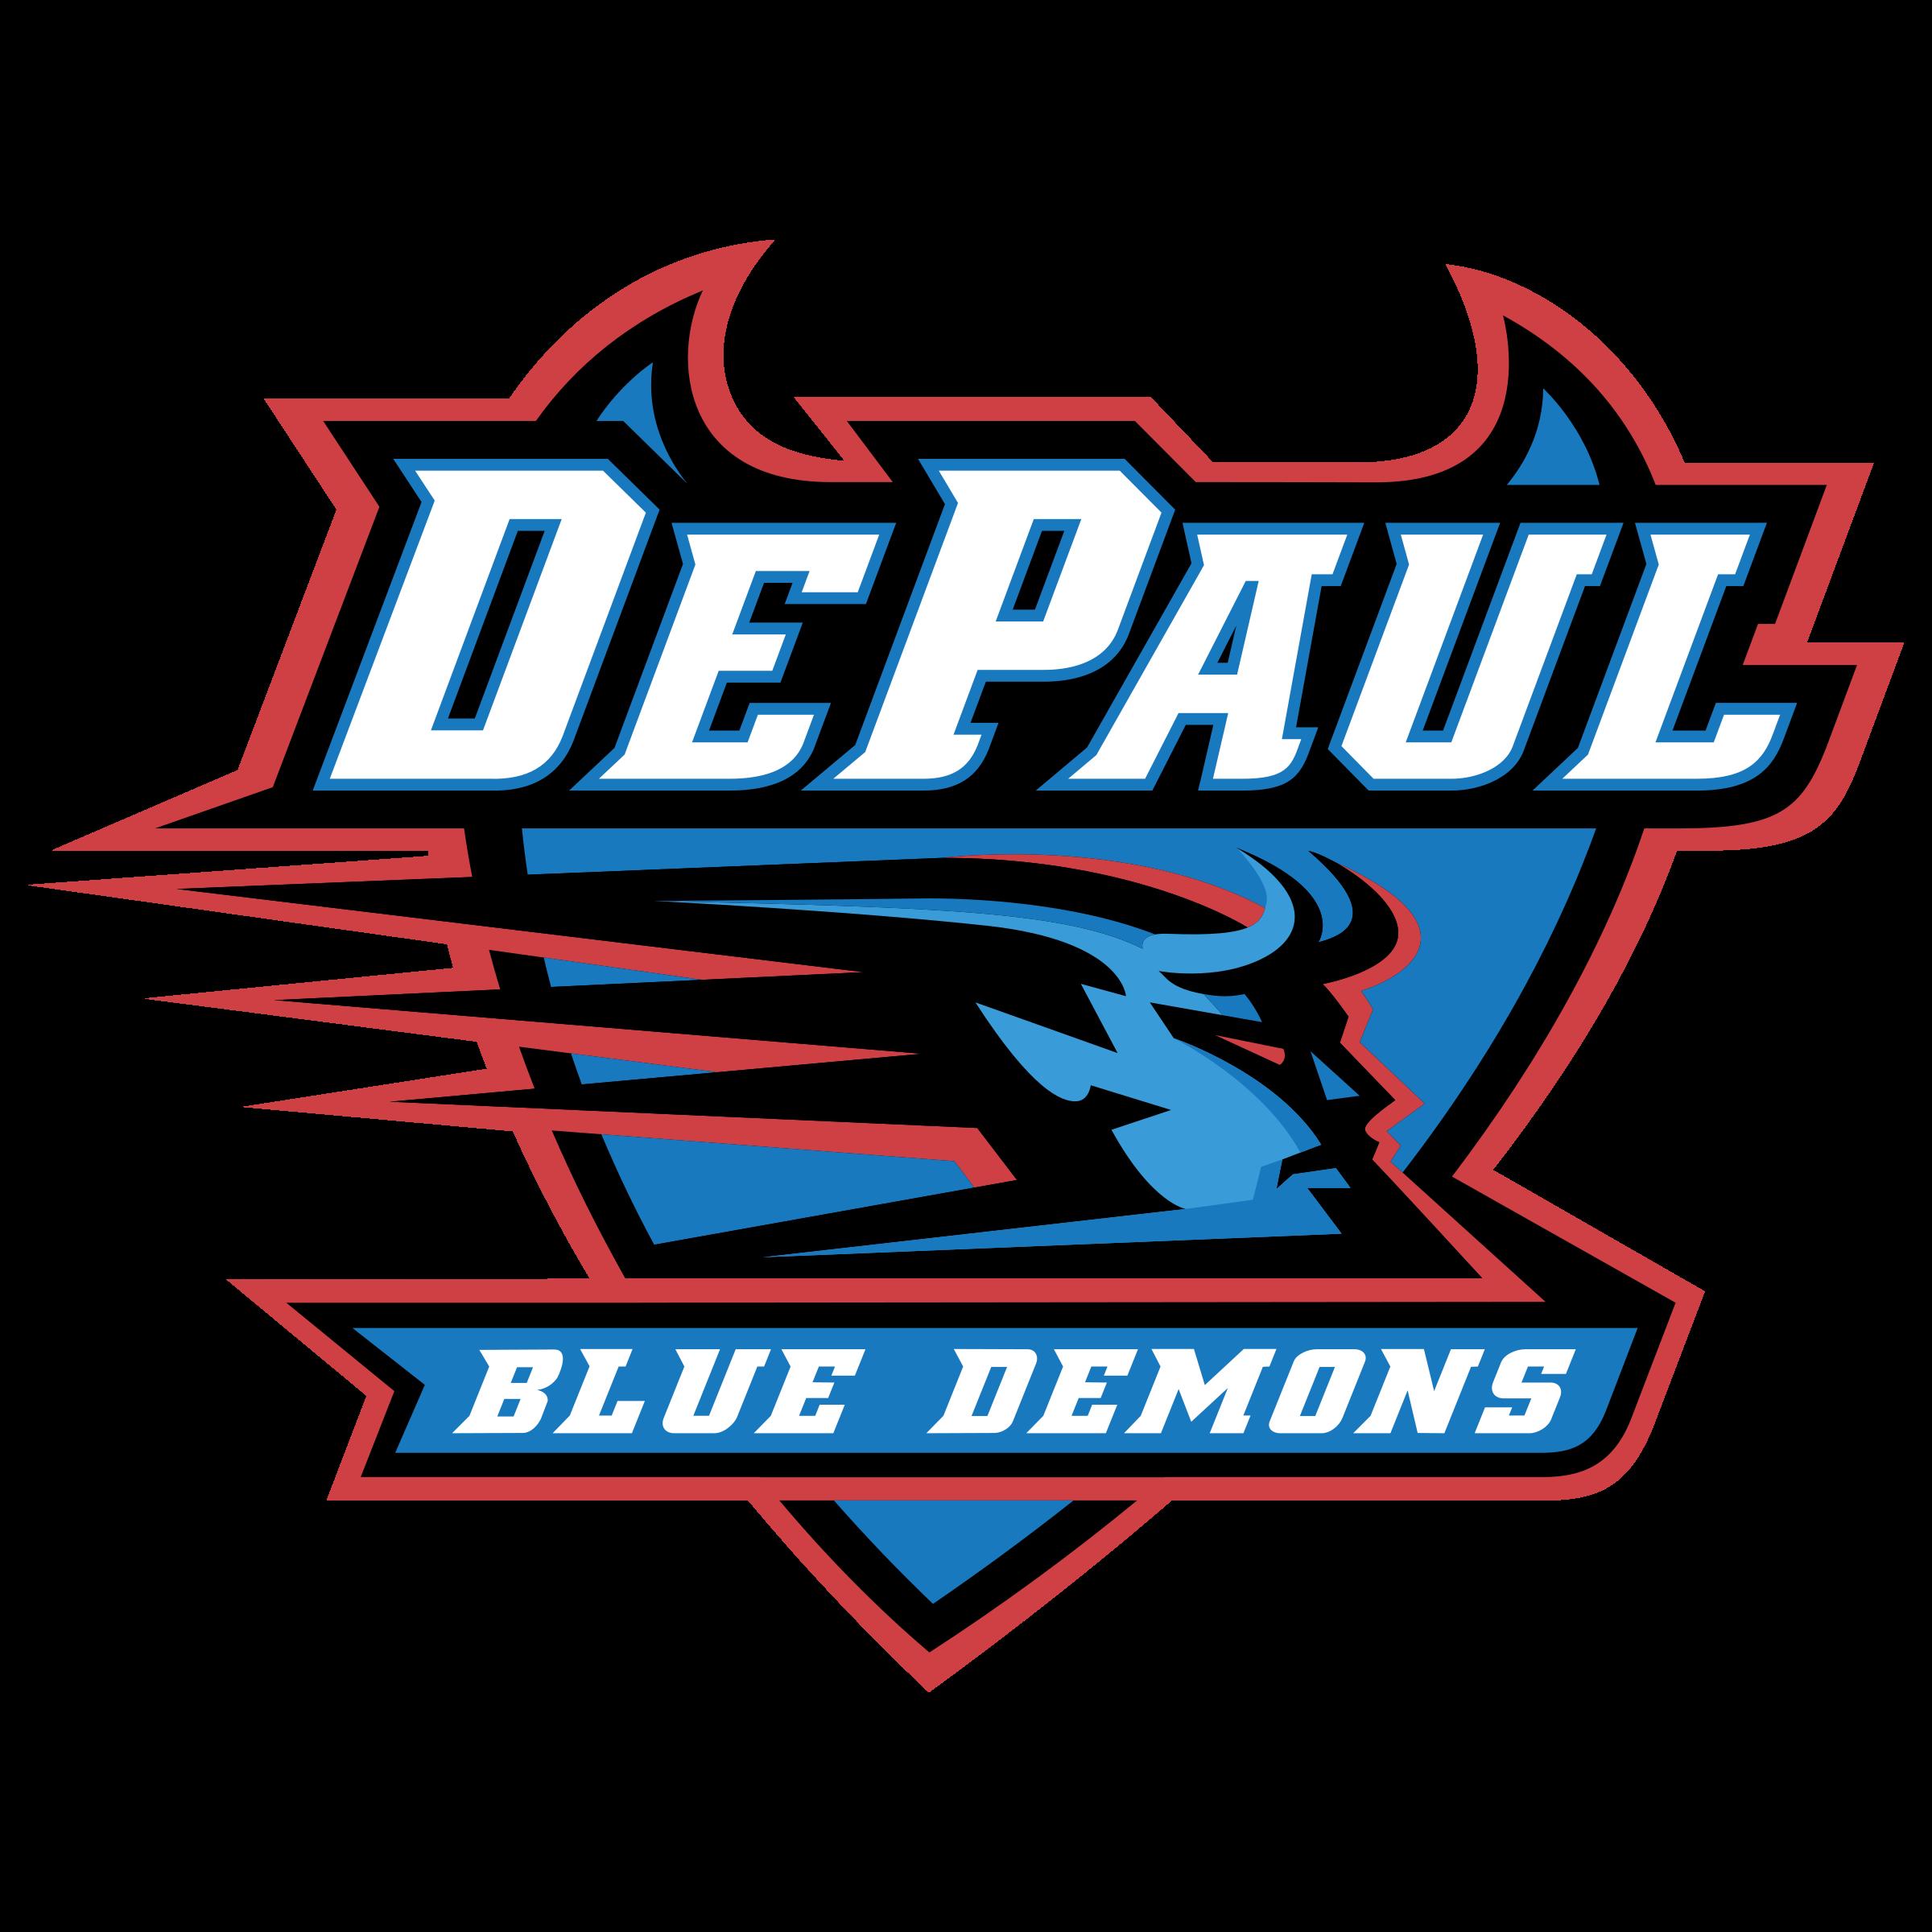 depaul-blue-demons-5-logo-png-transparent.png